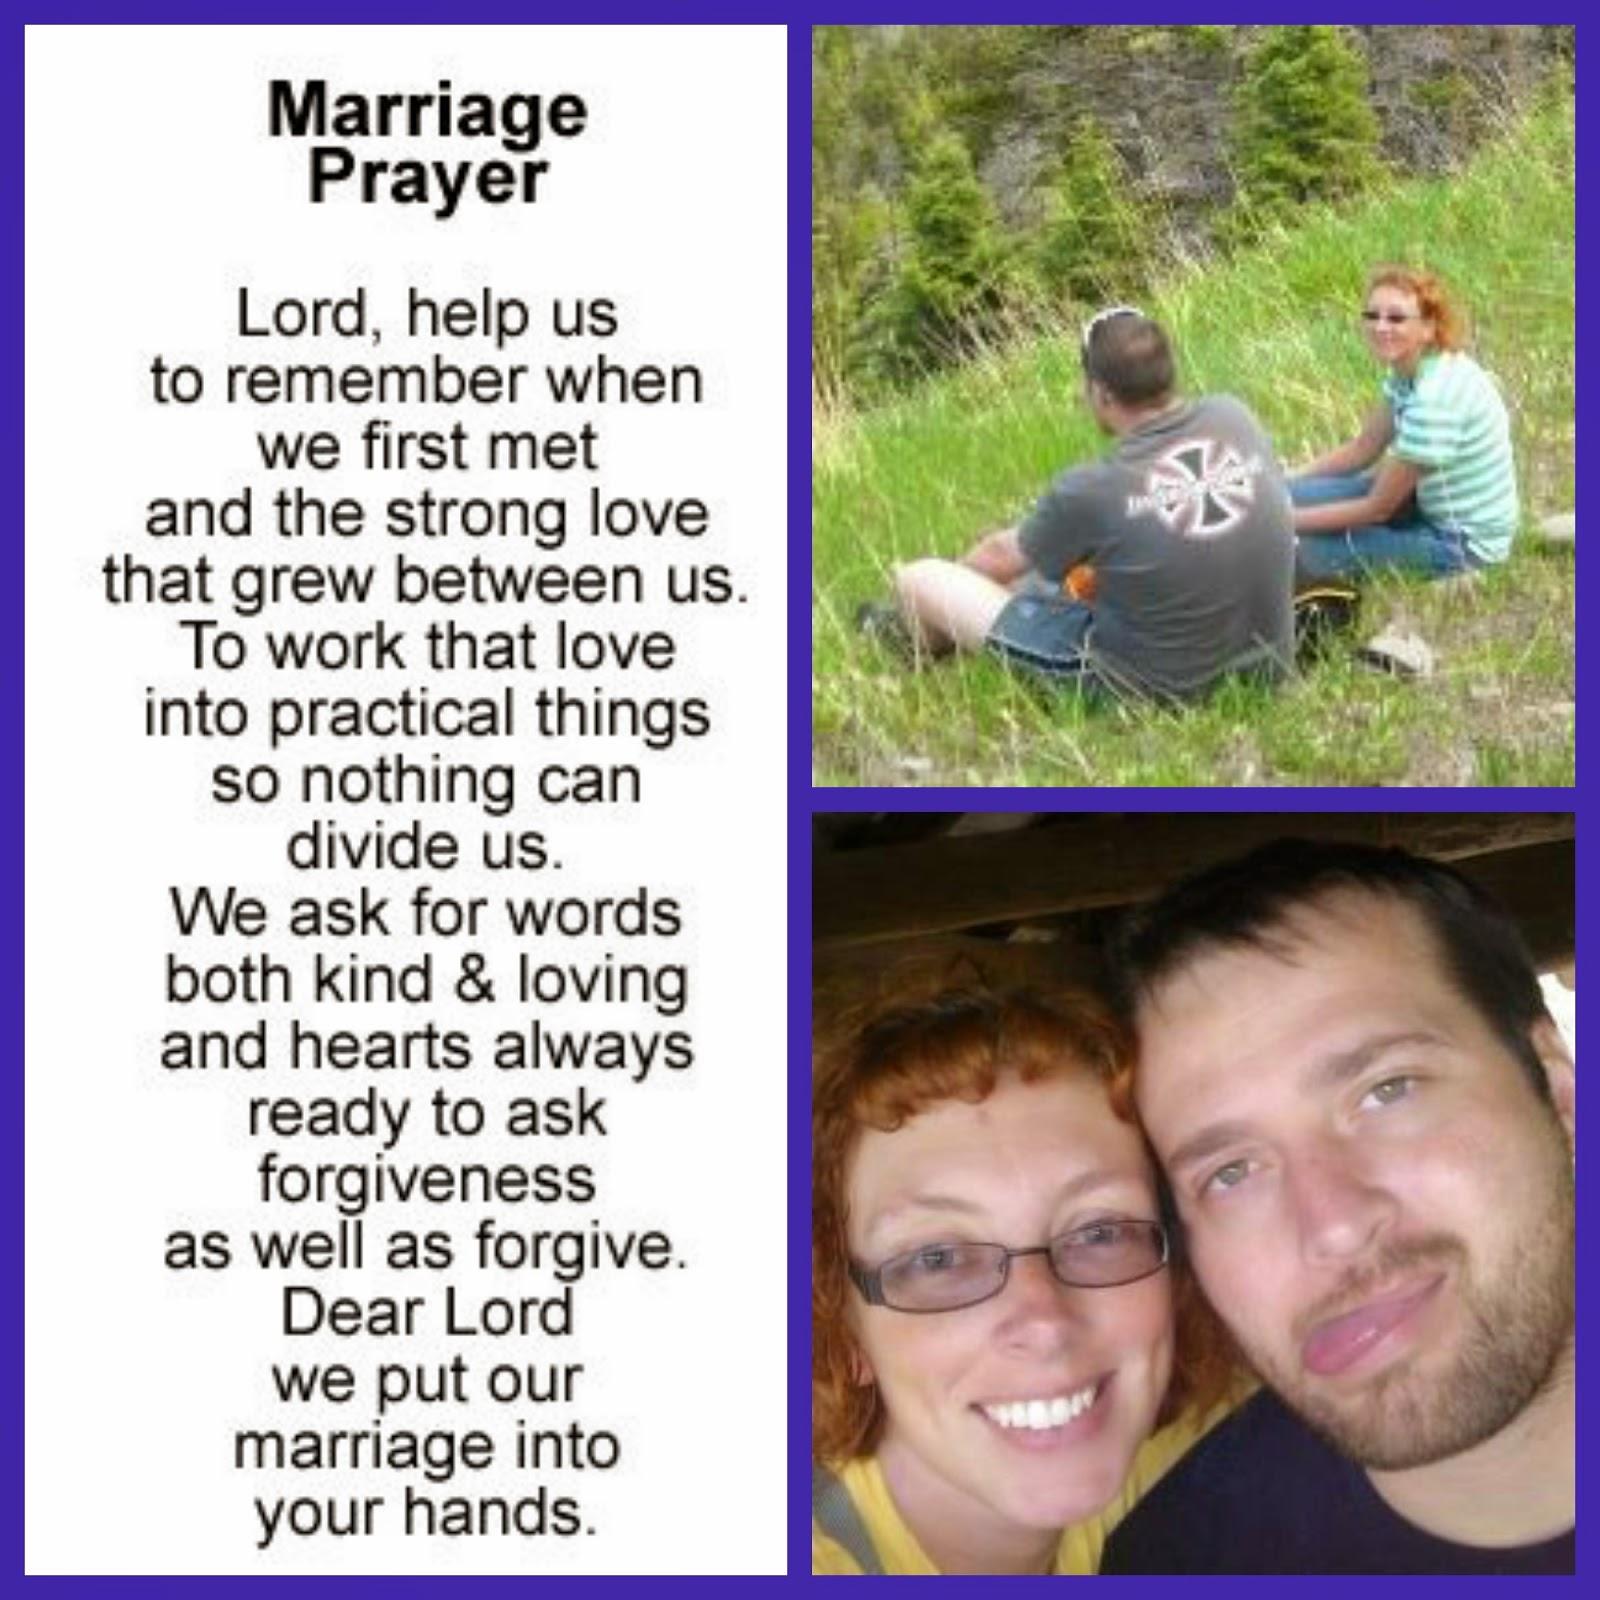 My Love Story: Erica's Story